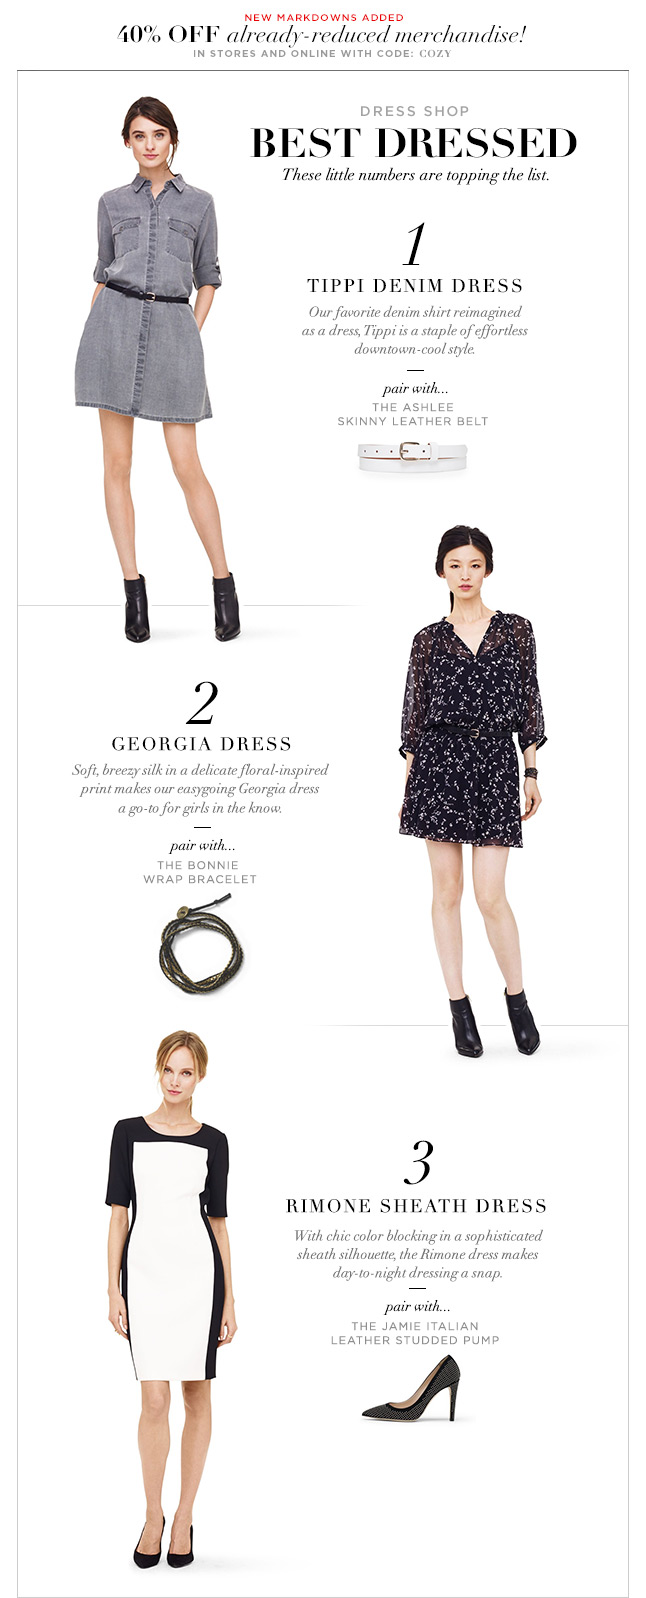 Dress Shop: Our New Top Favorites